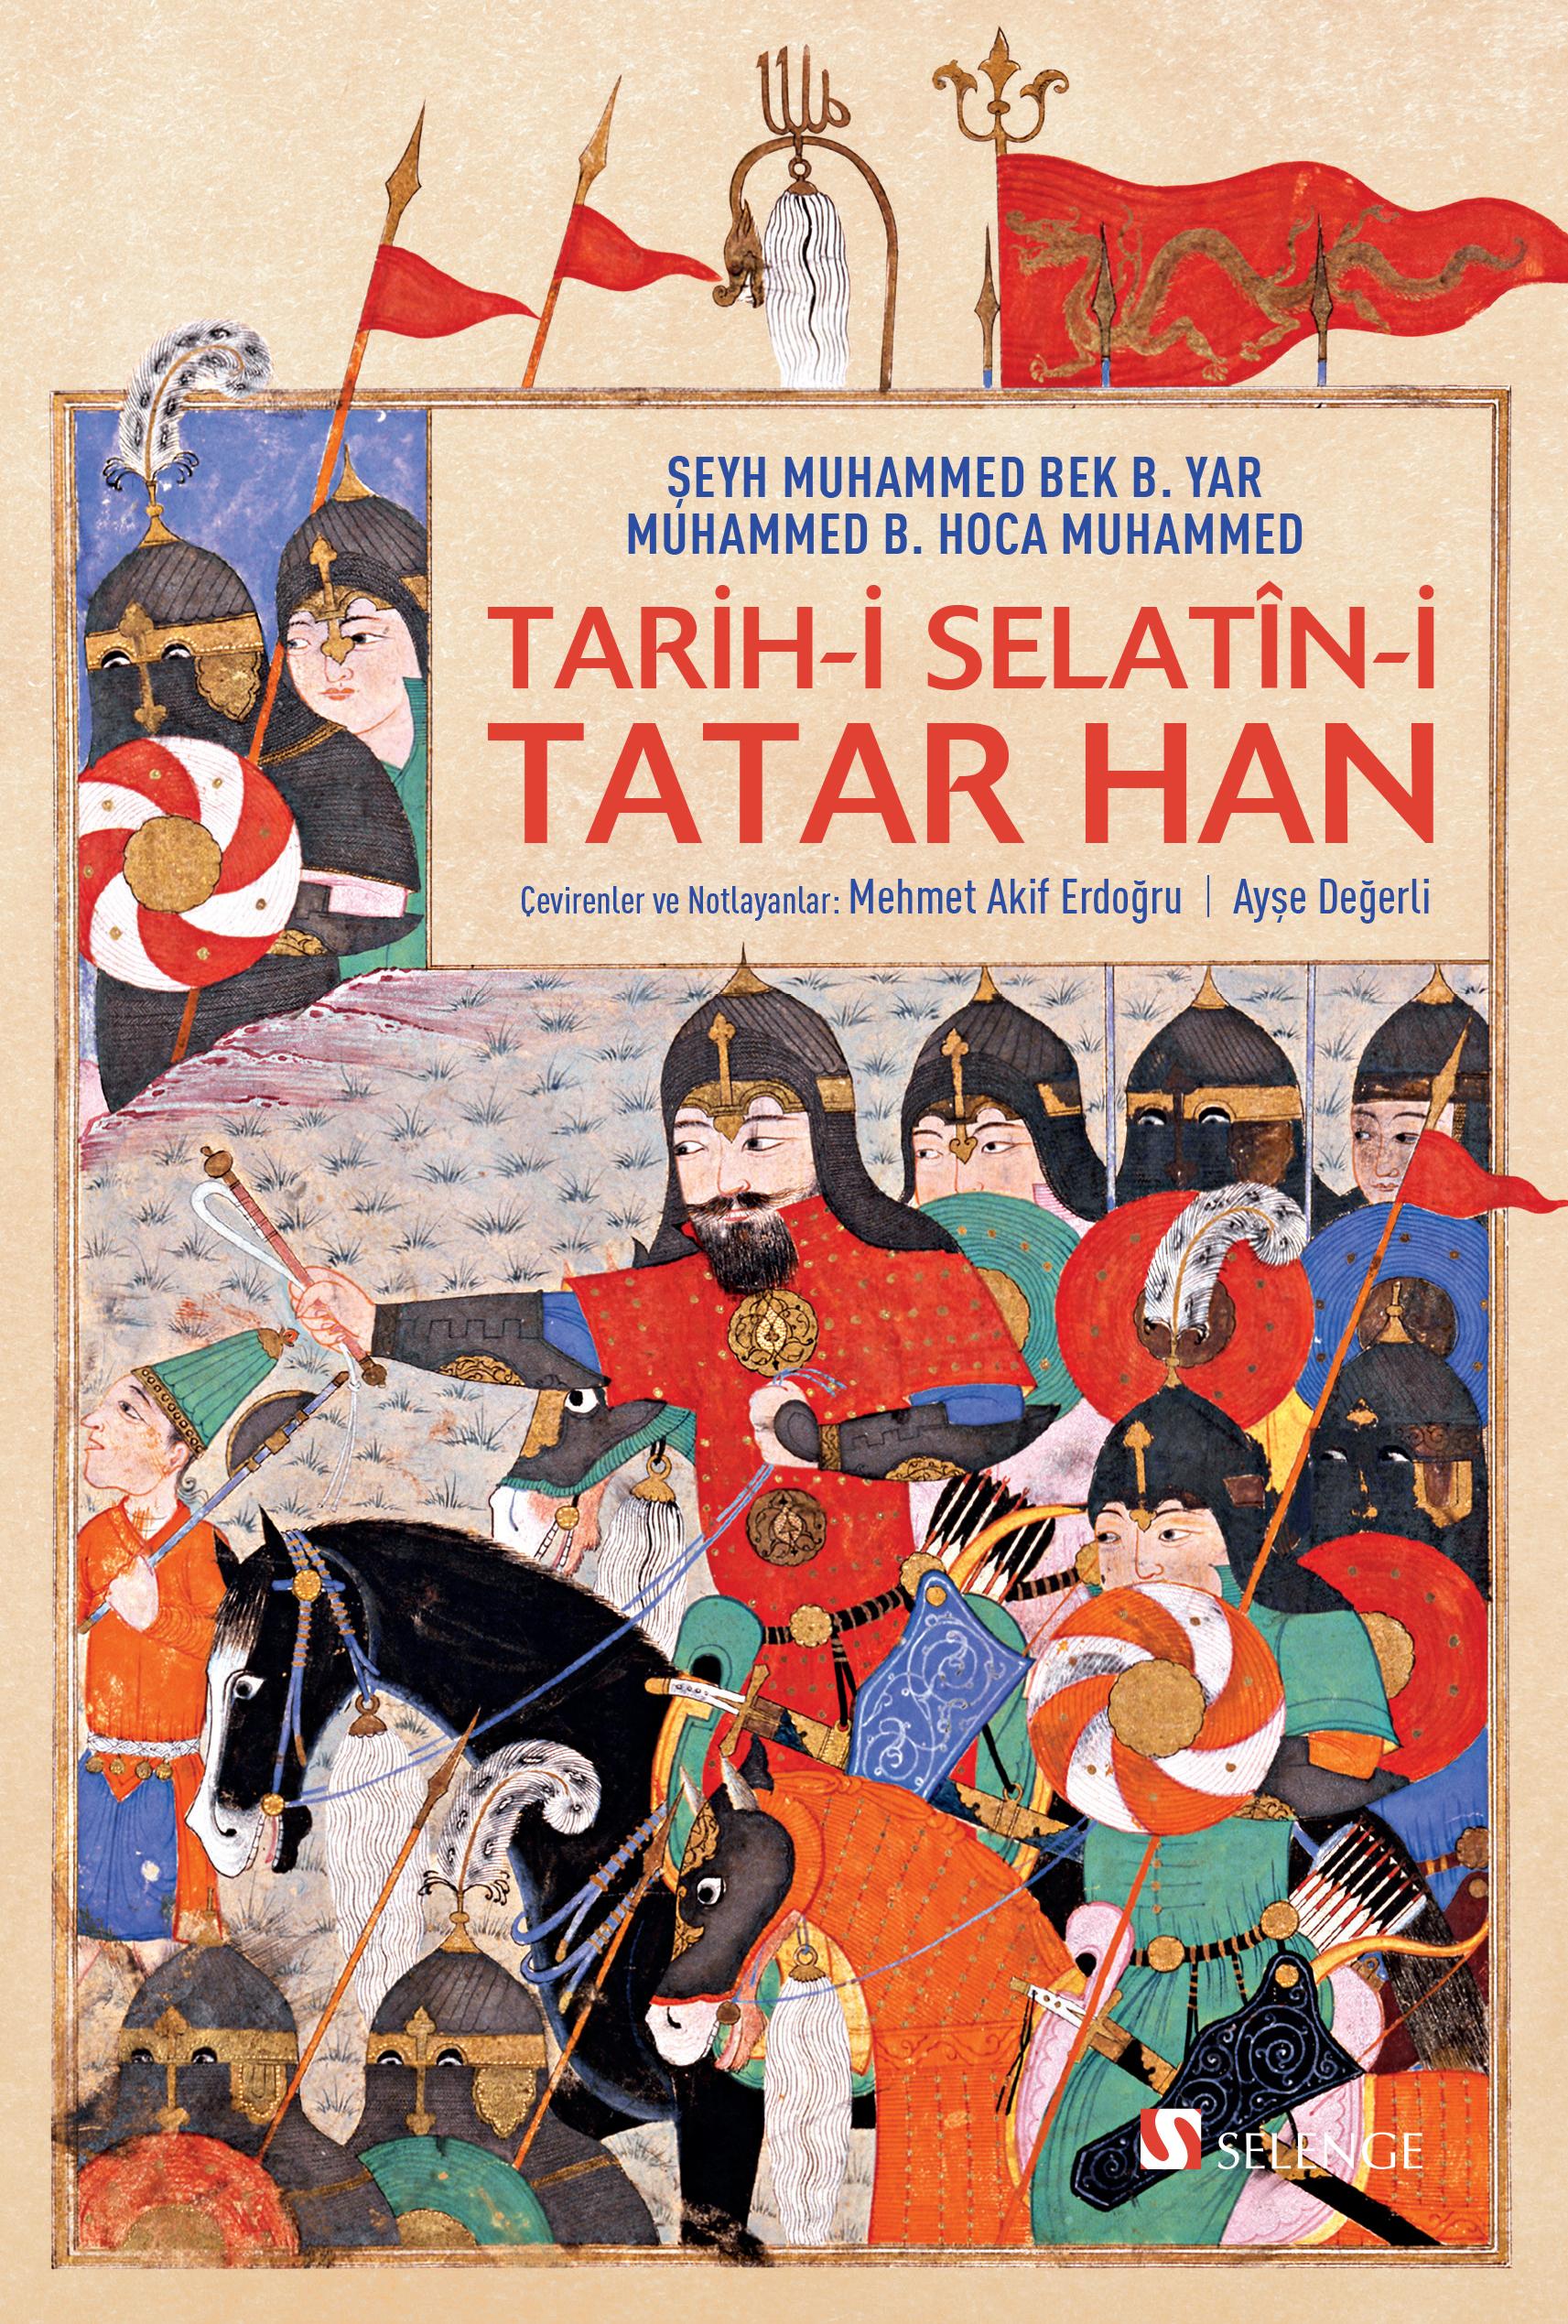 Tarih-i Selatîn-i Tatar Han - Tatar Han Sultanlarının Tarihi